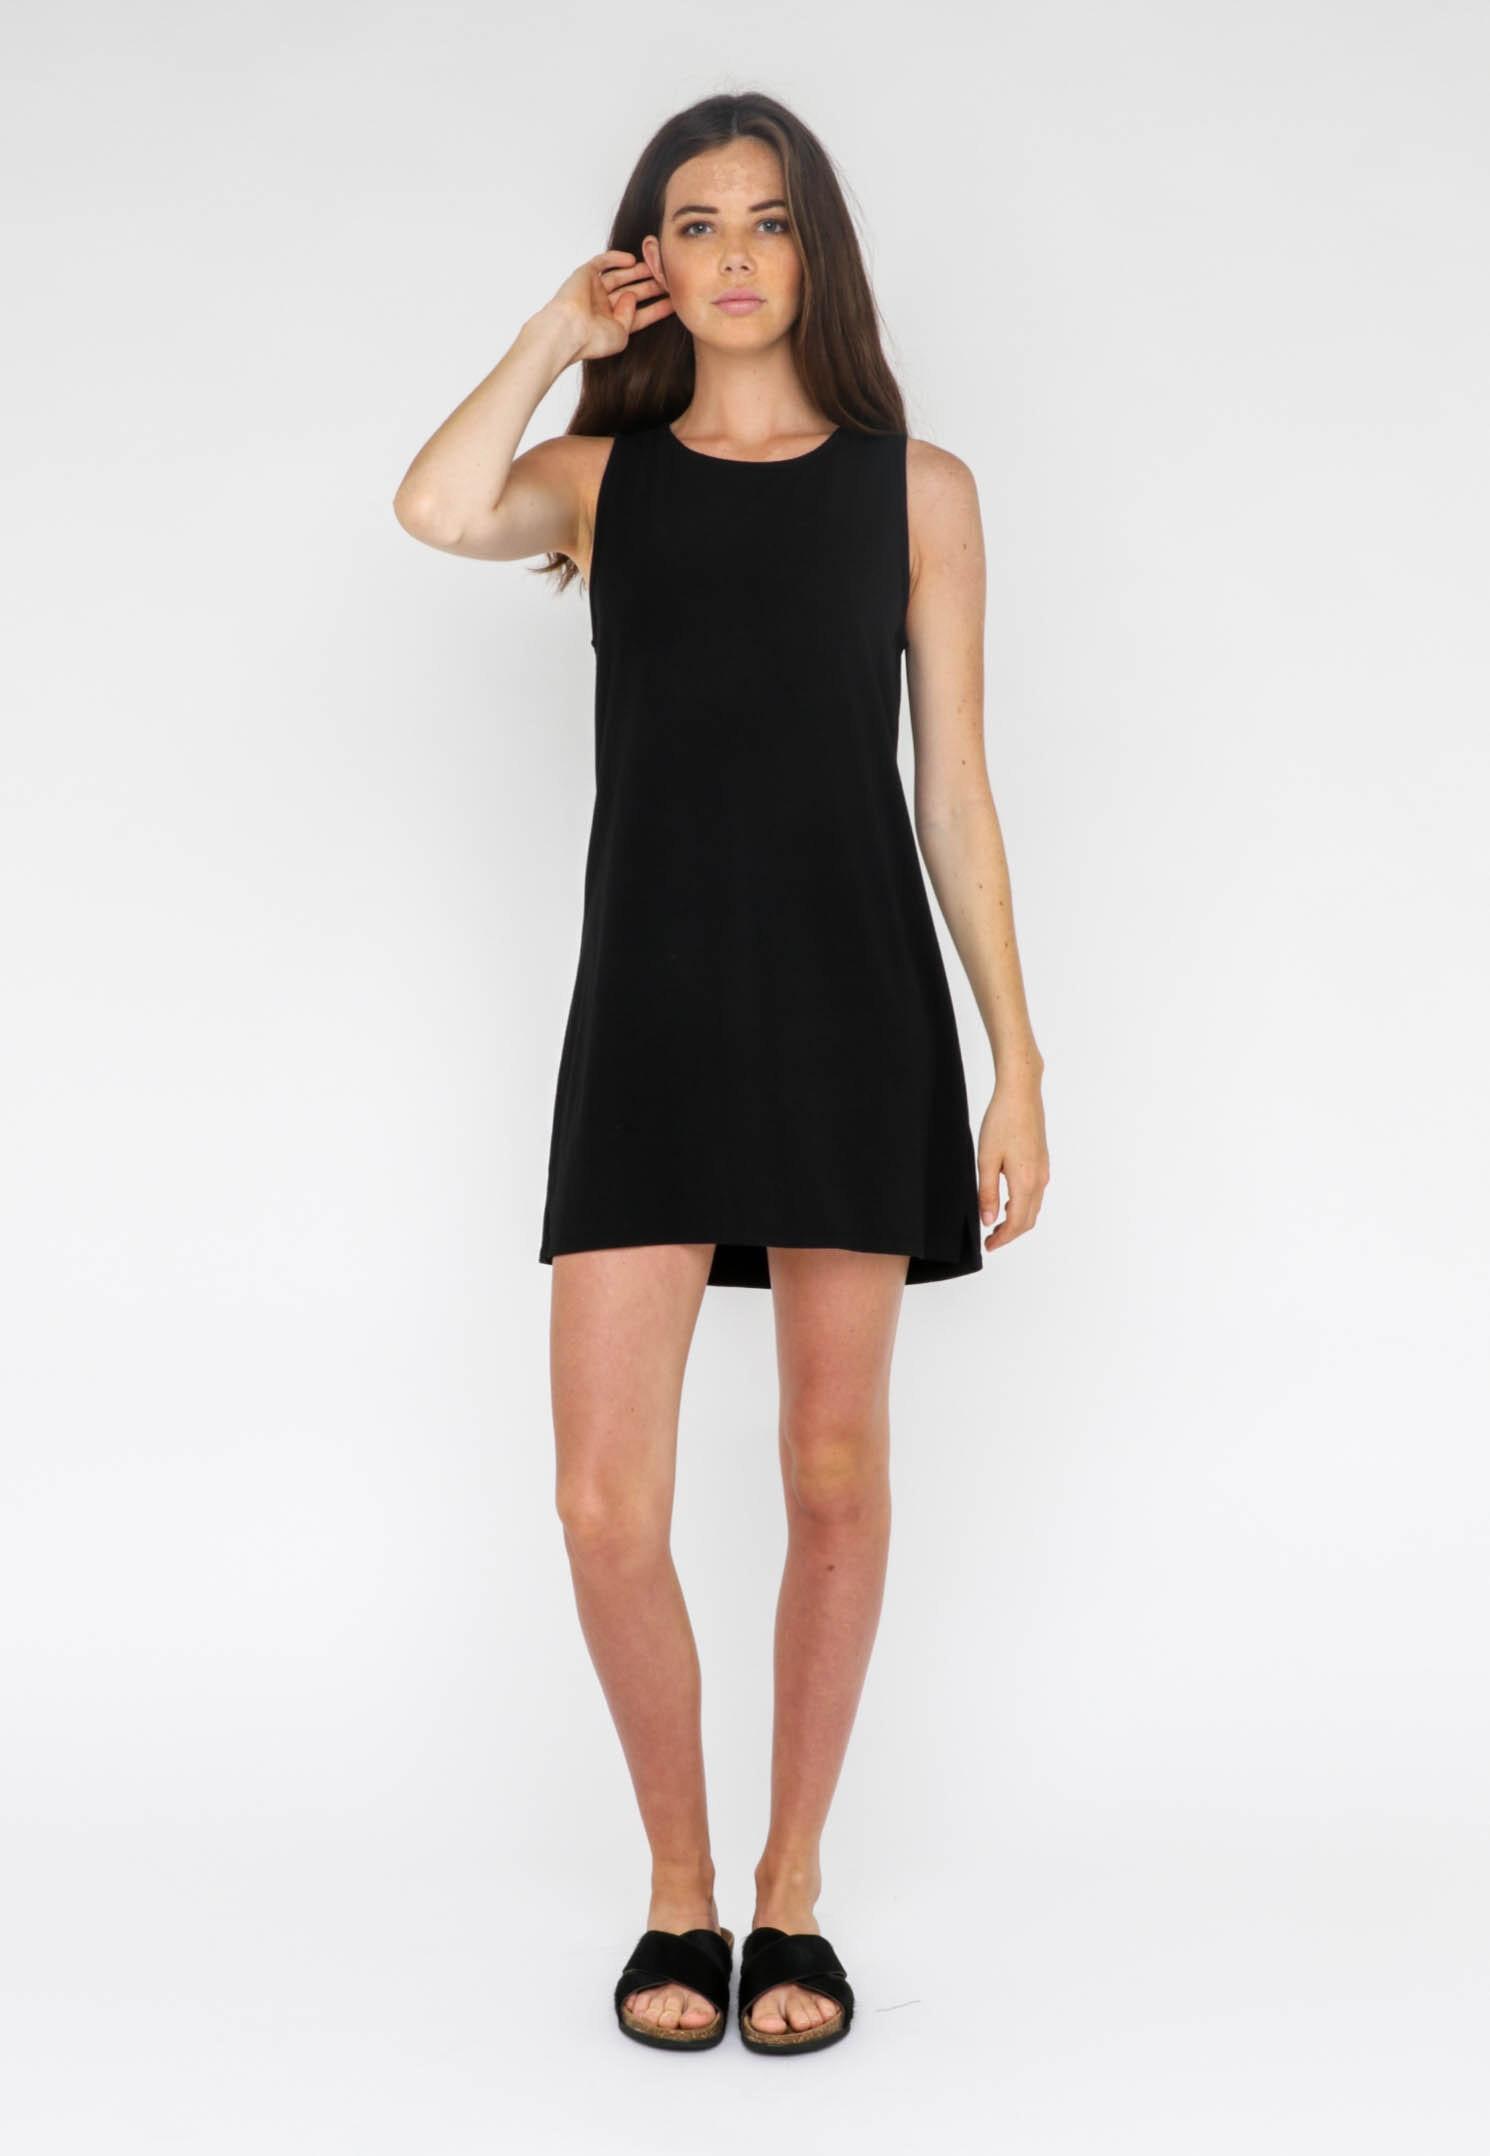 Silent Theory - Knox Tank Dress - Black